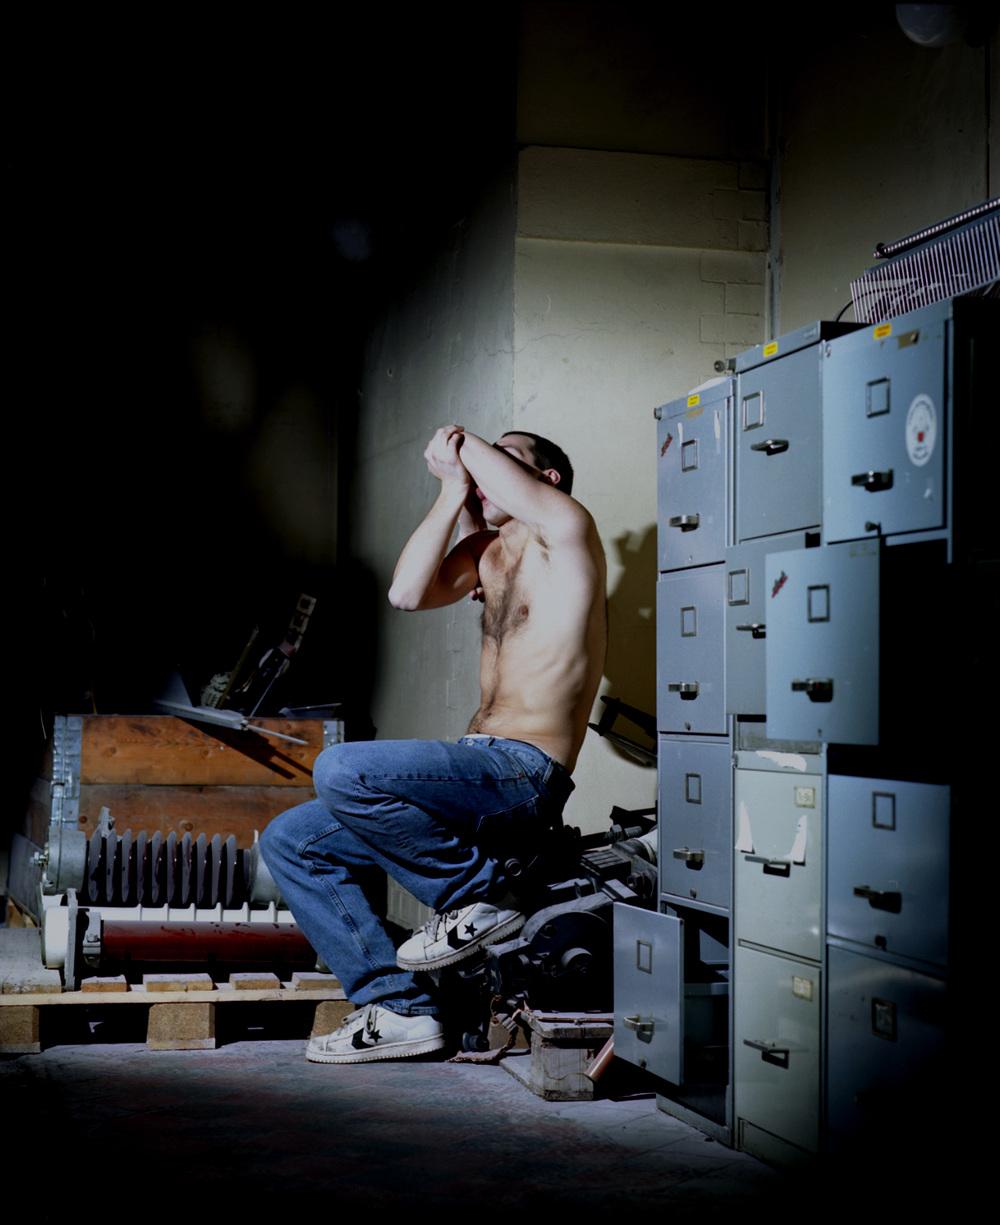 Autoerotic Scene, 2001